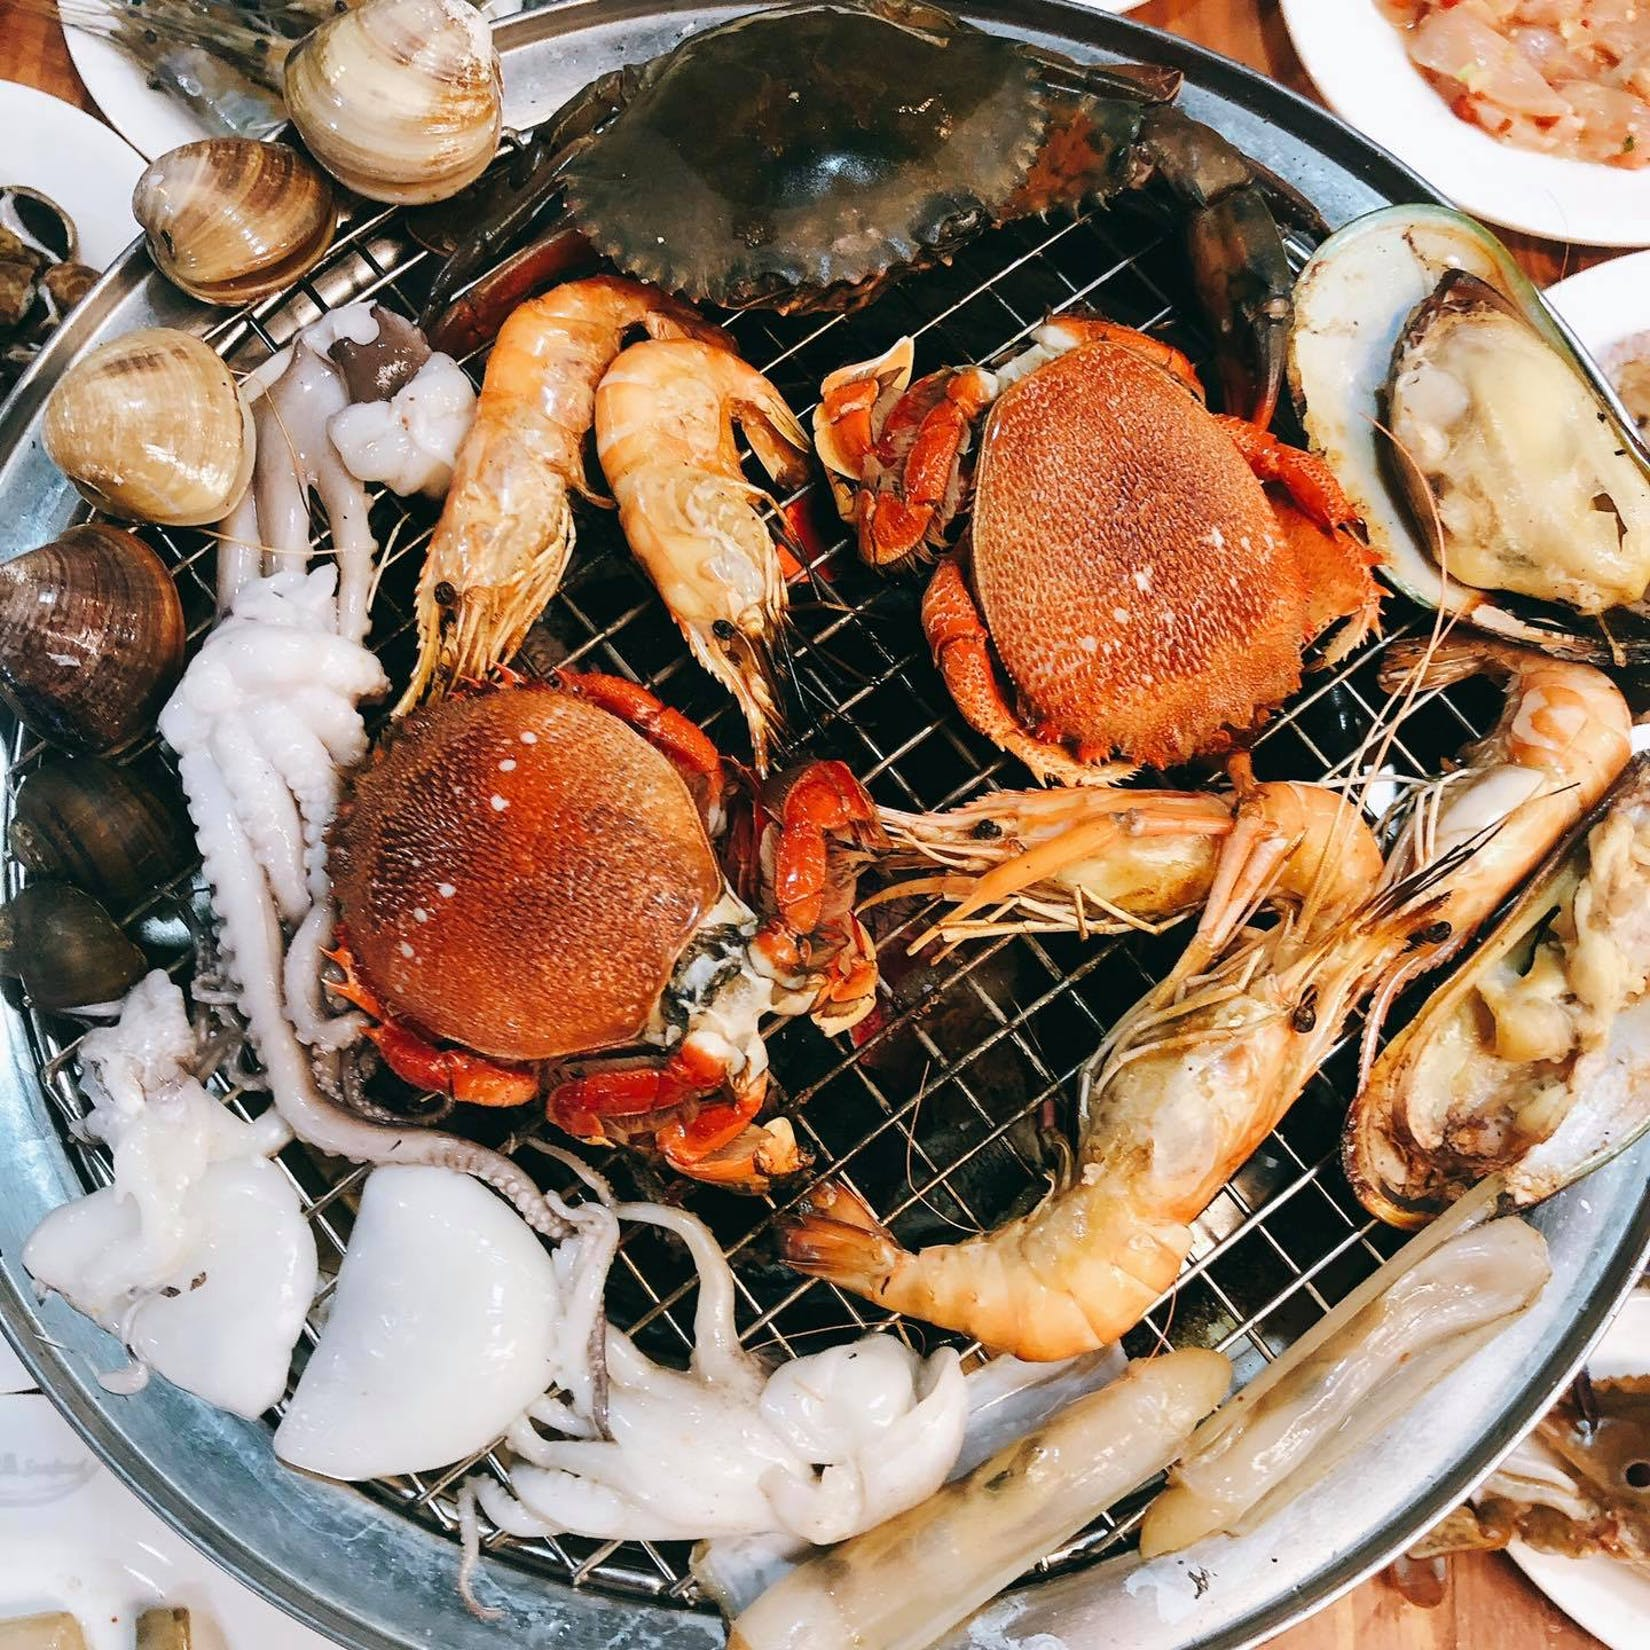 scuba seafood - bbq seafood buffet | yathar